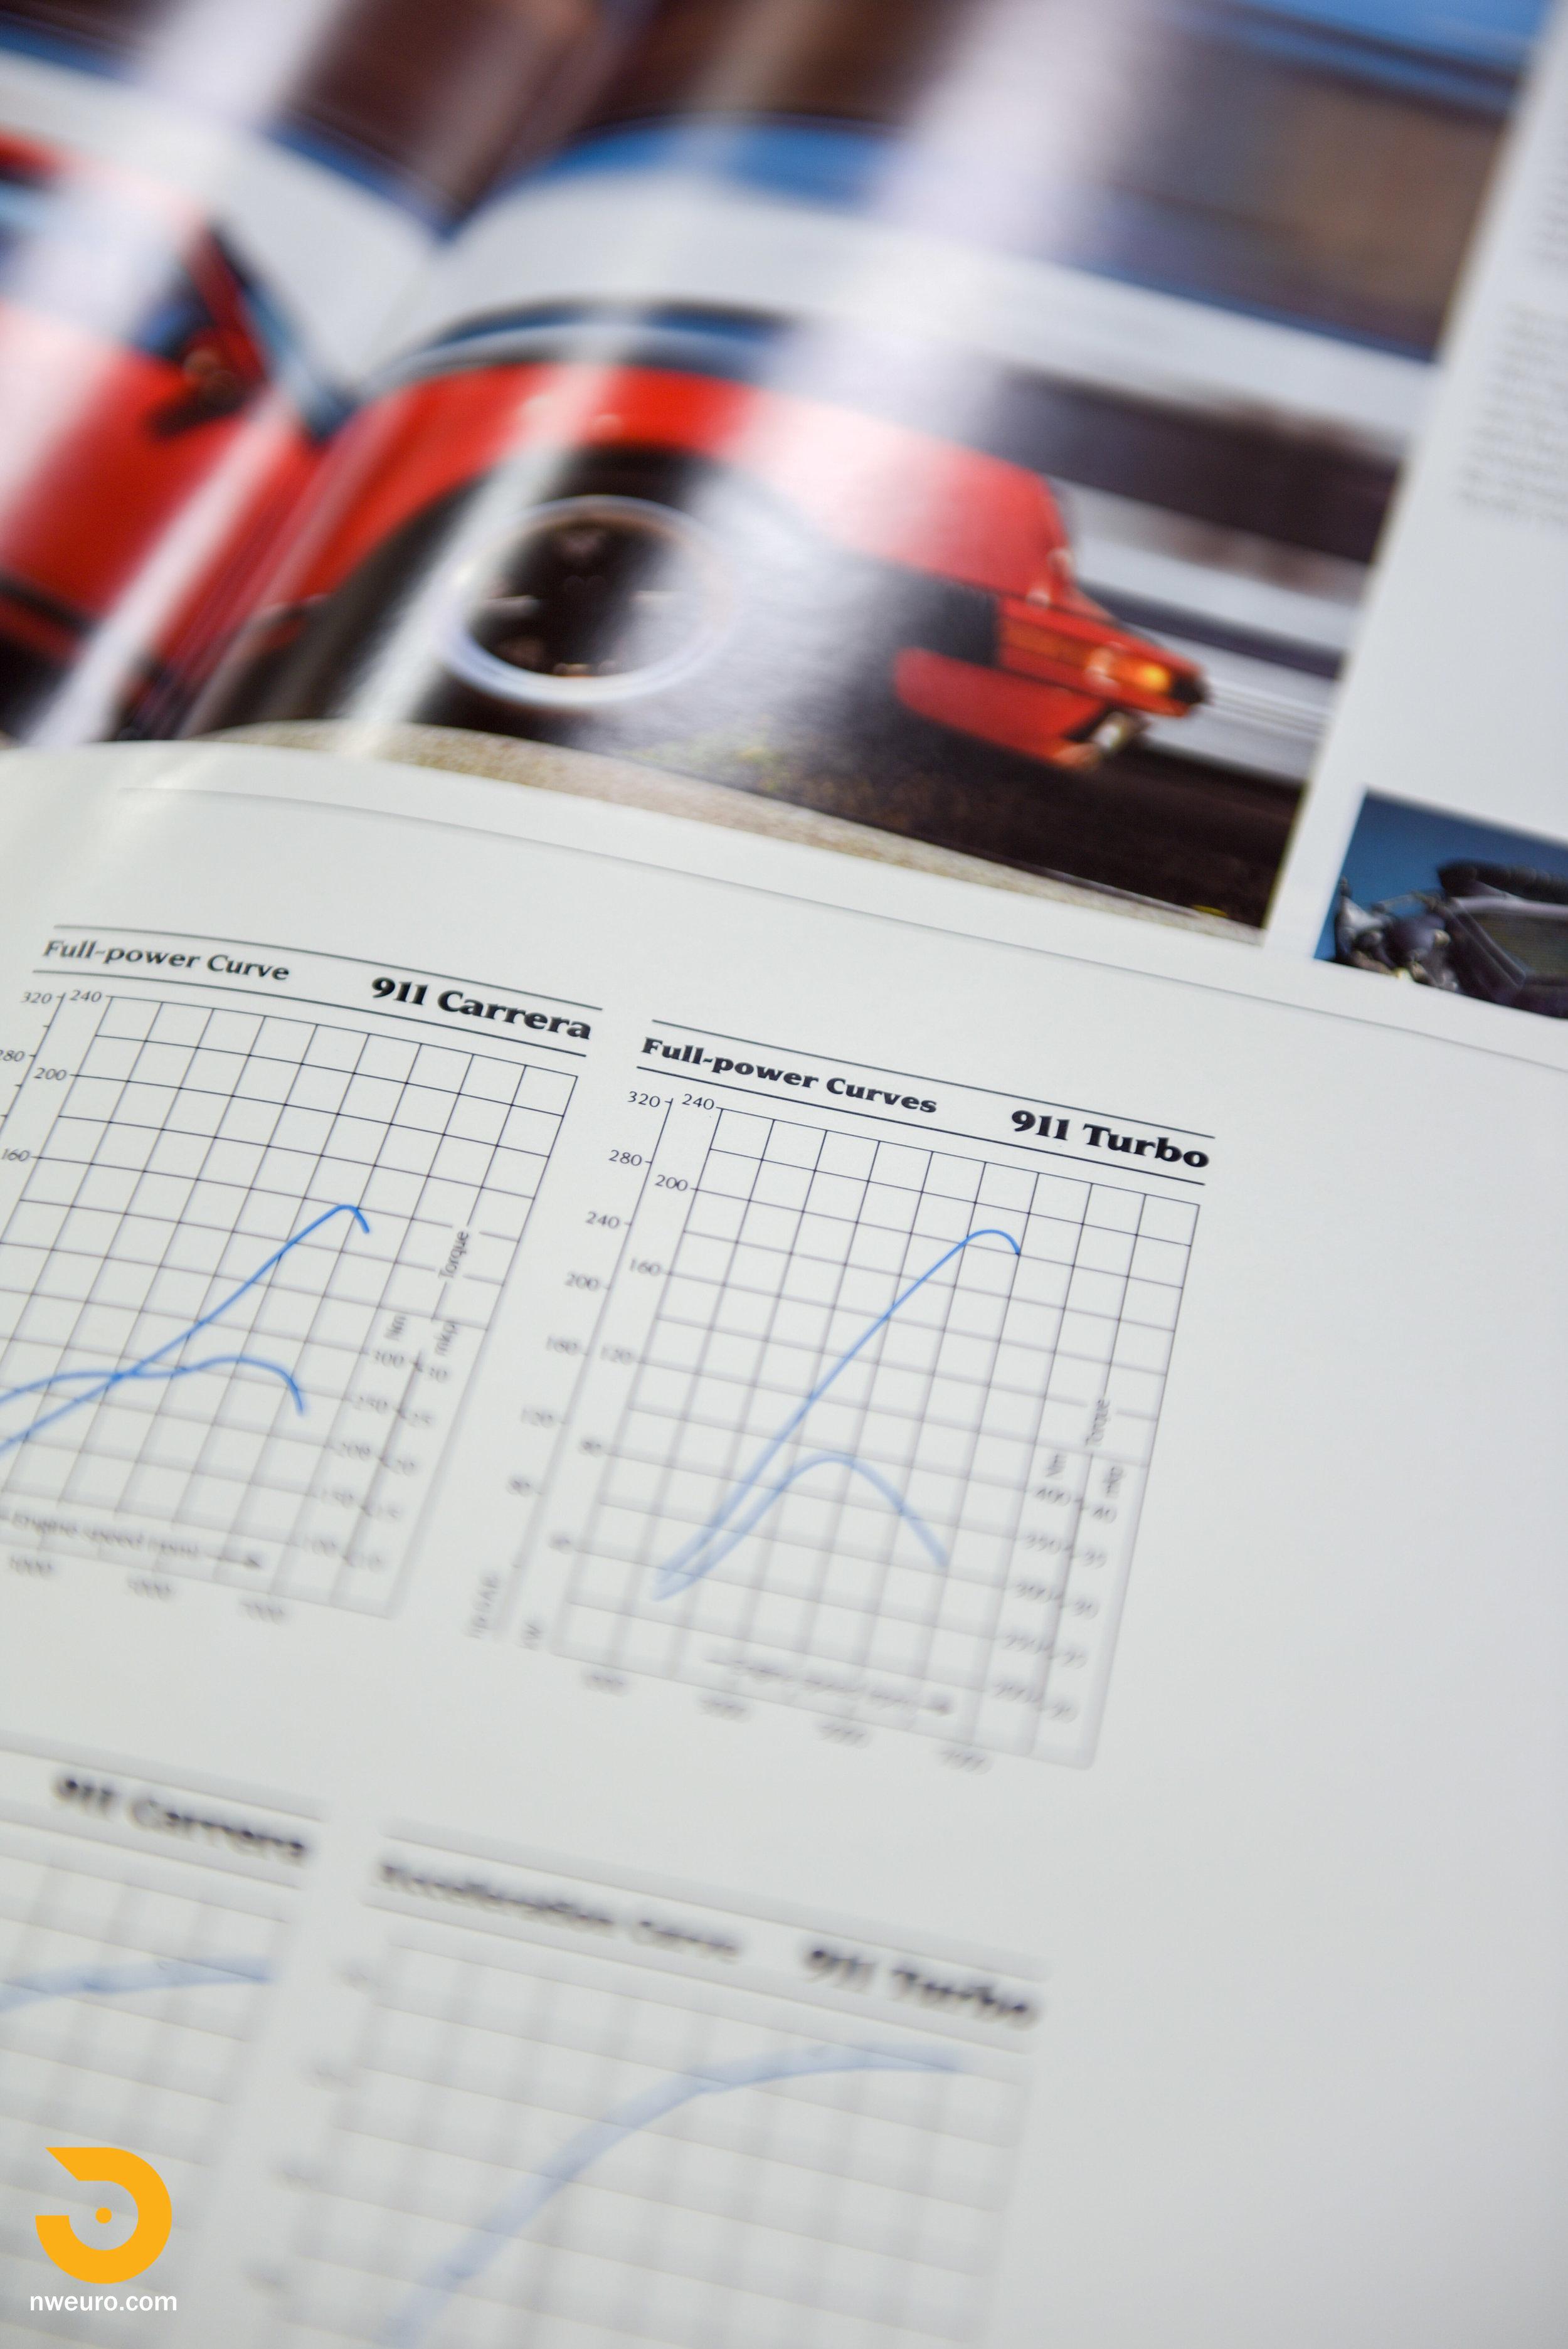 1987 Porsche 930 Slant Nose Cab Details-6.jpg